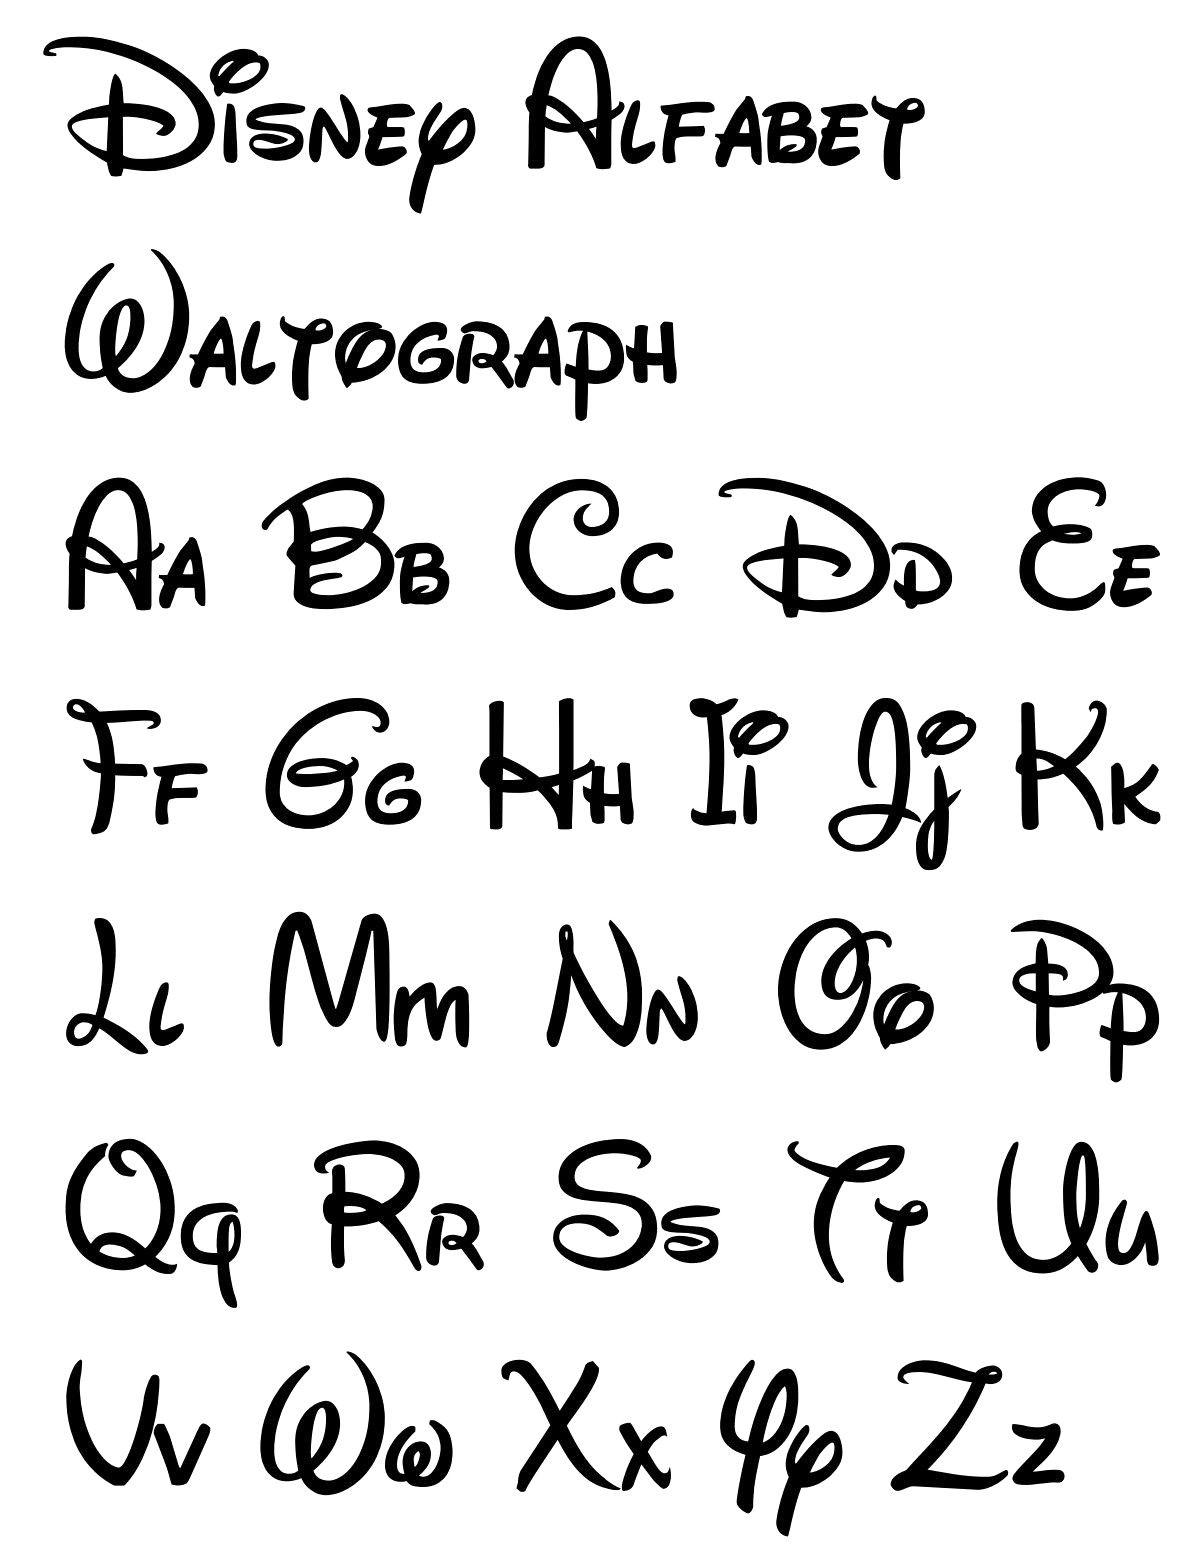 Free Printable Disney Letter Stencils | Disney | Pinterest - Free Printable Calligraphy Letter Stencils